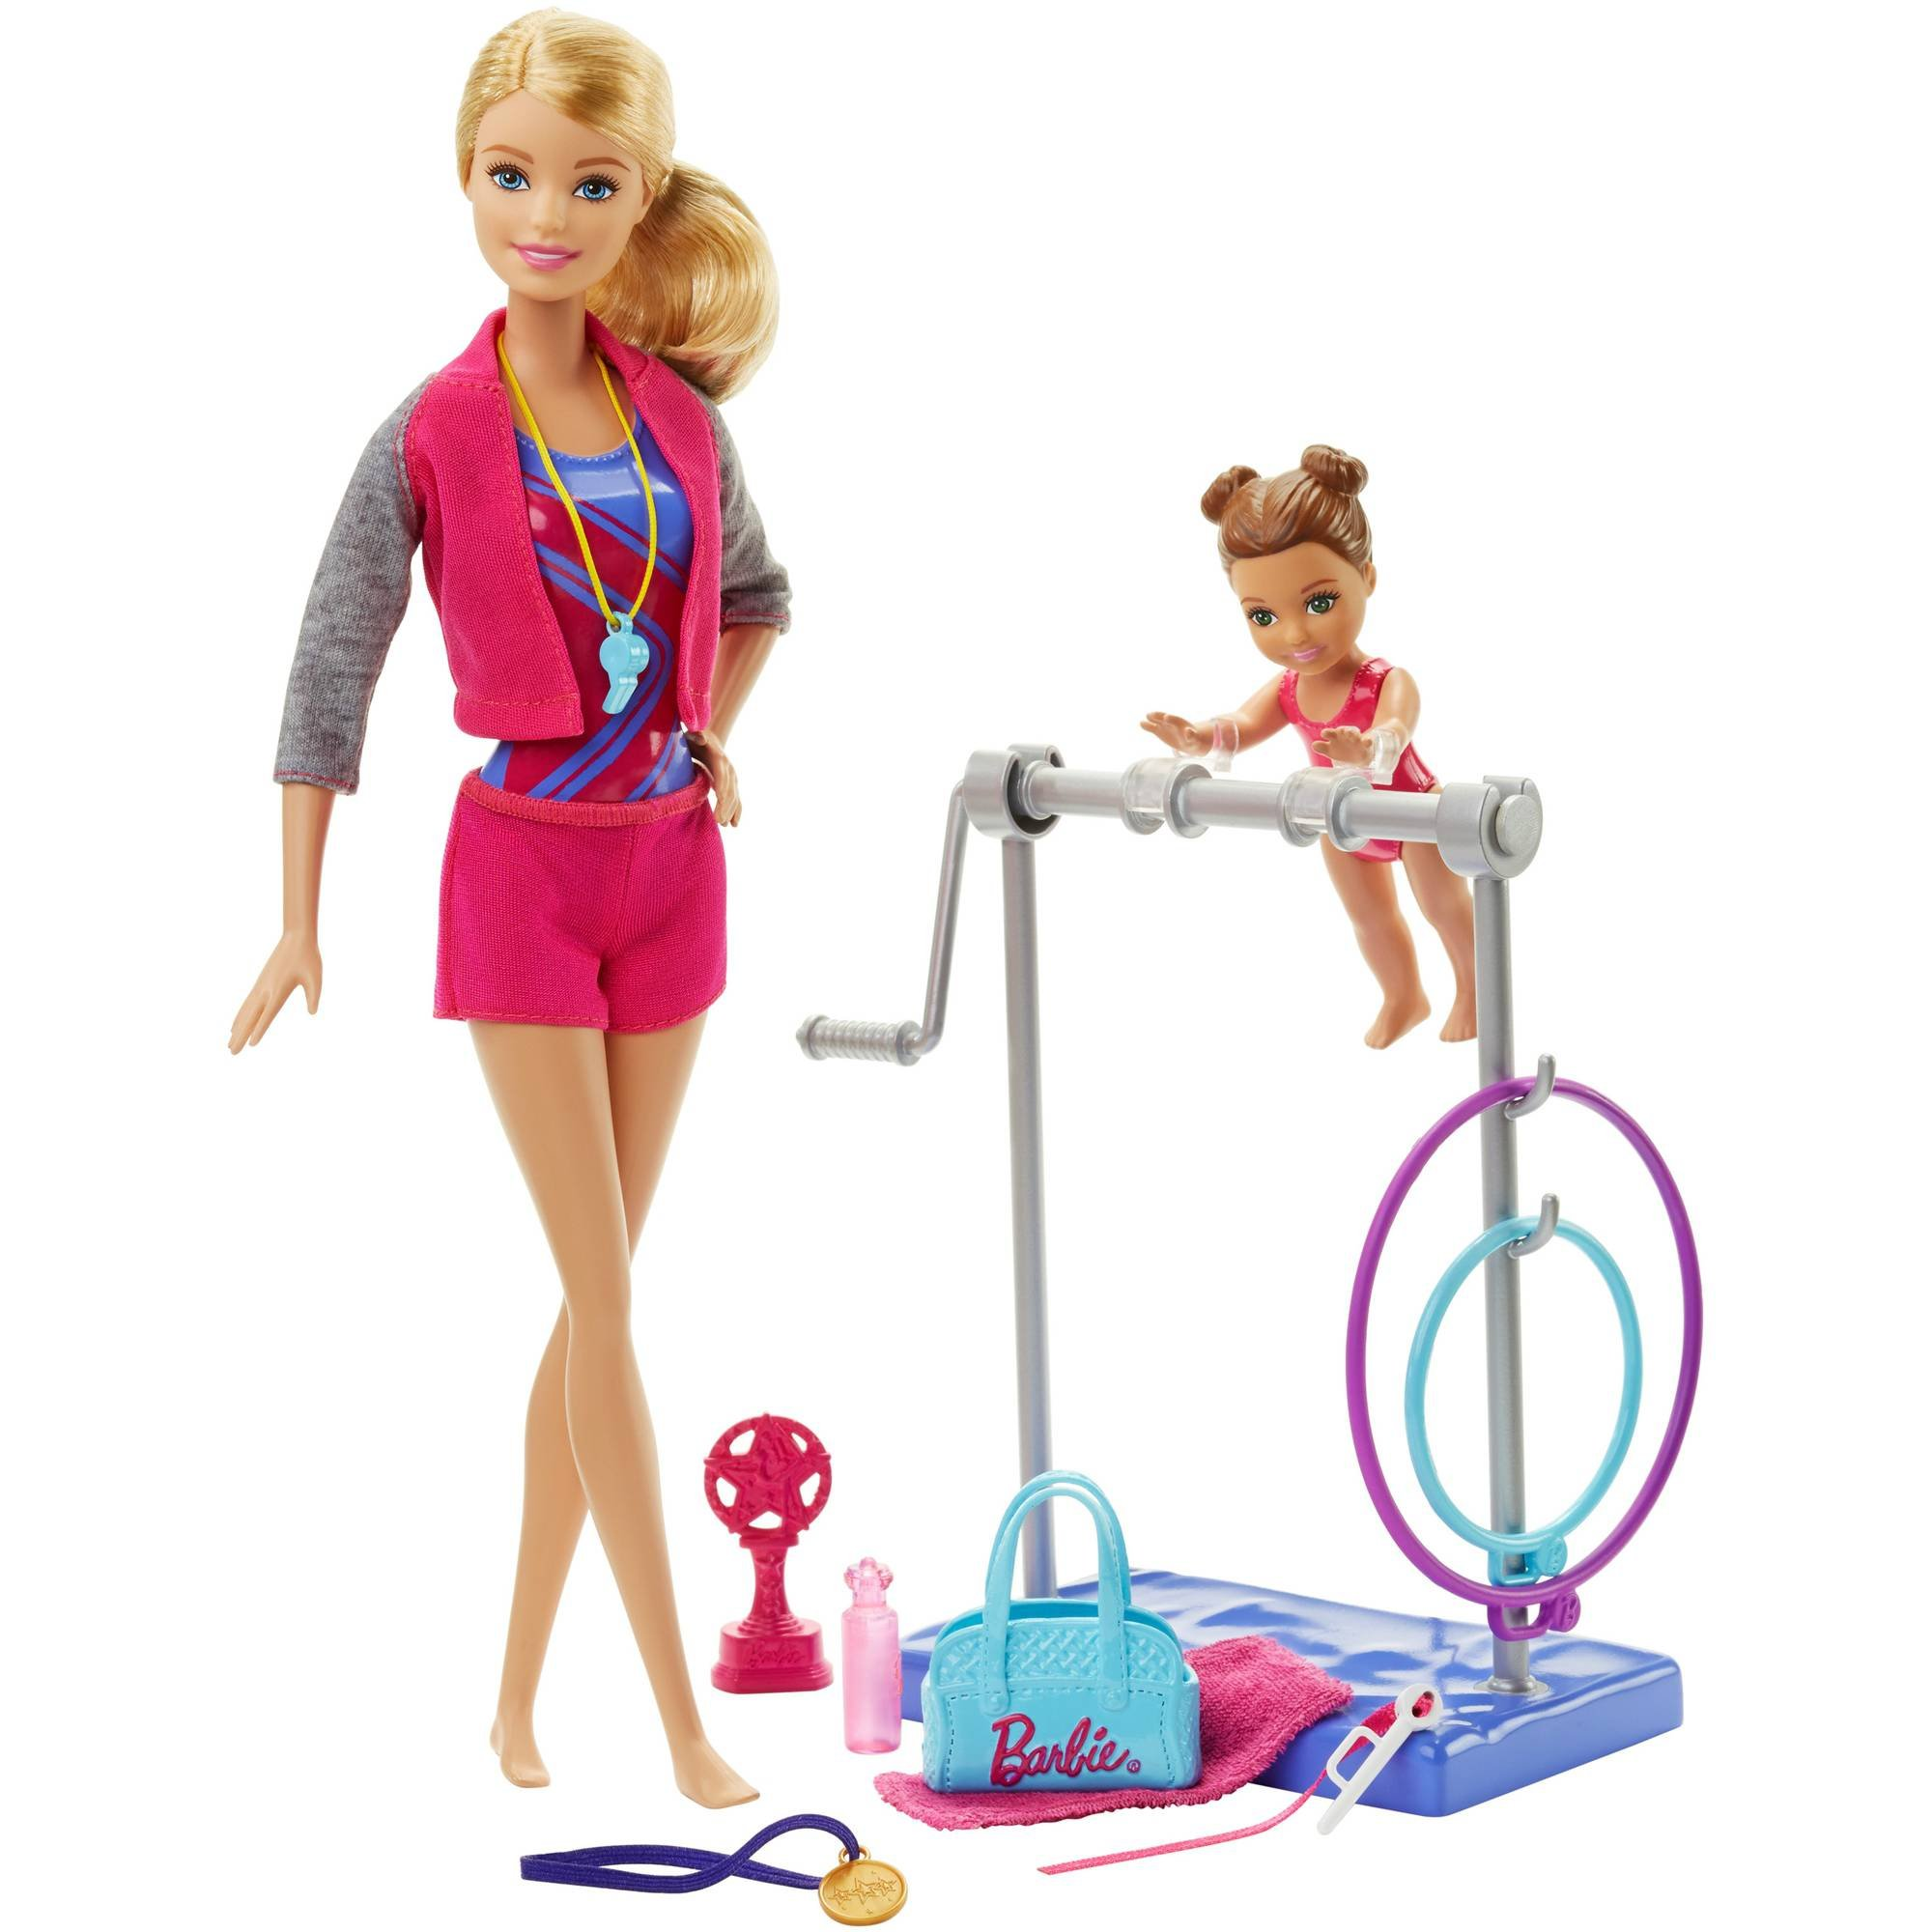 Barbie Gymnastic Coach Doll and Playset